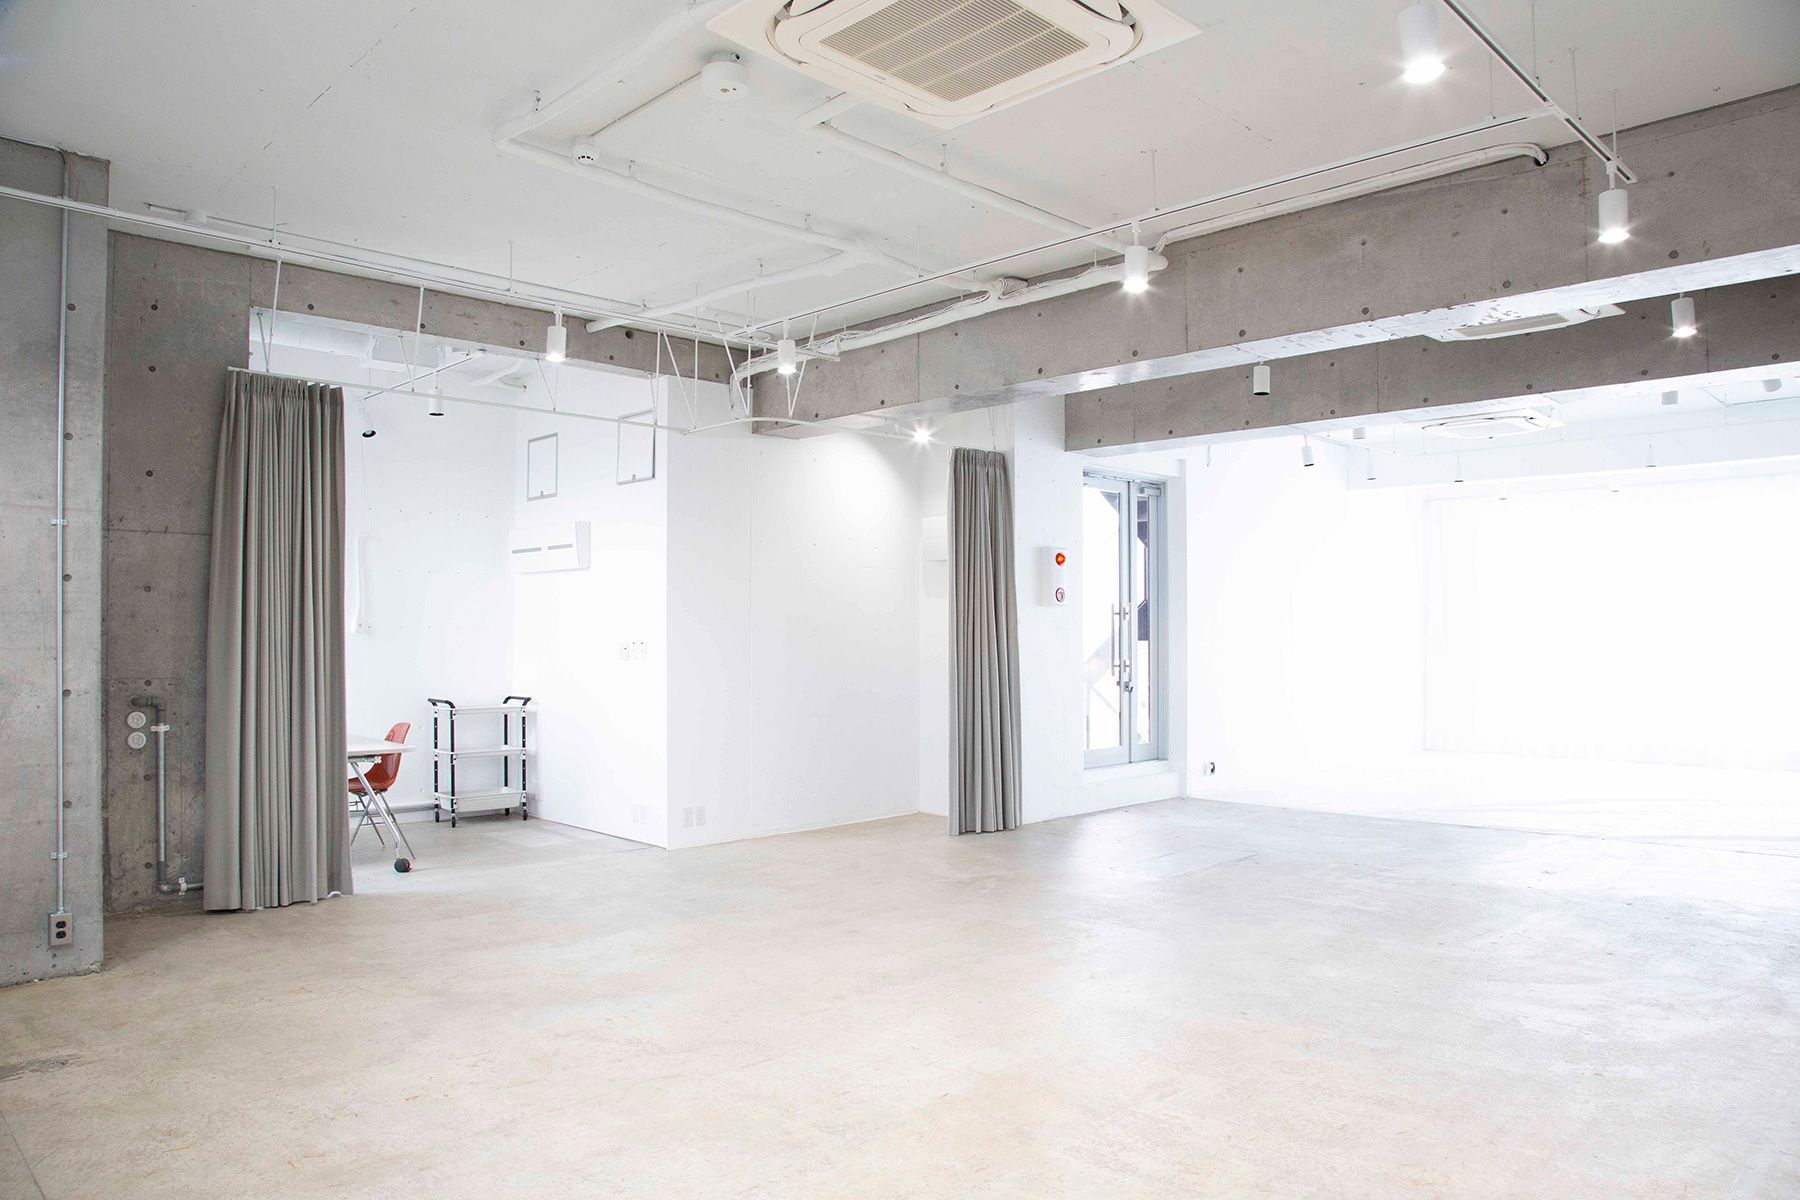 STUDIO LAILA (スタジオ ライラ)自然光がきれいな空間